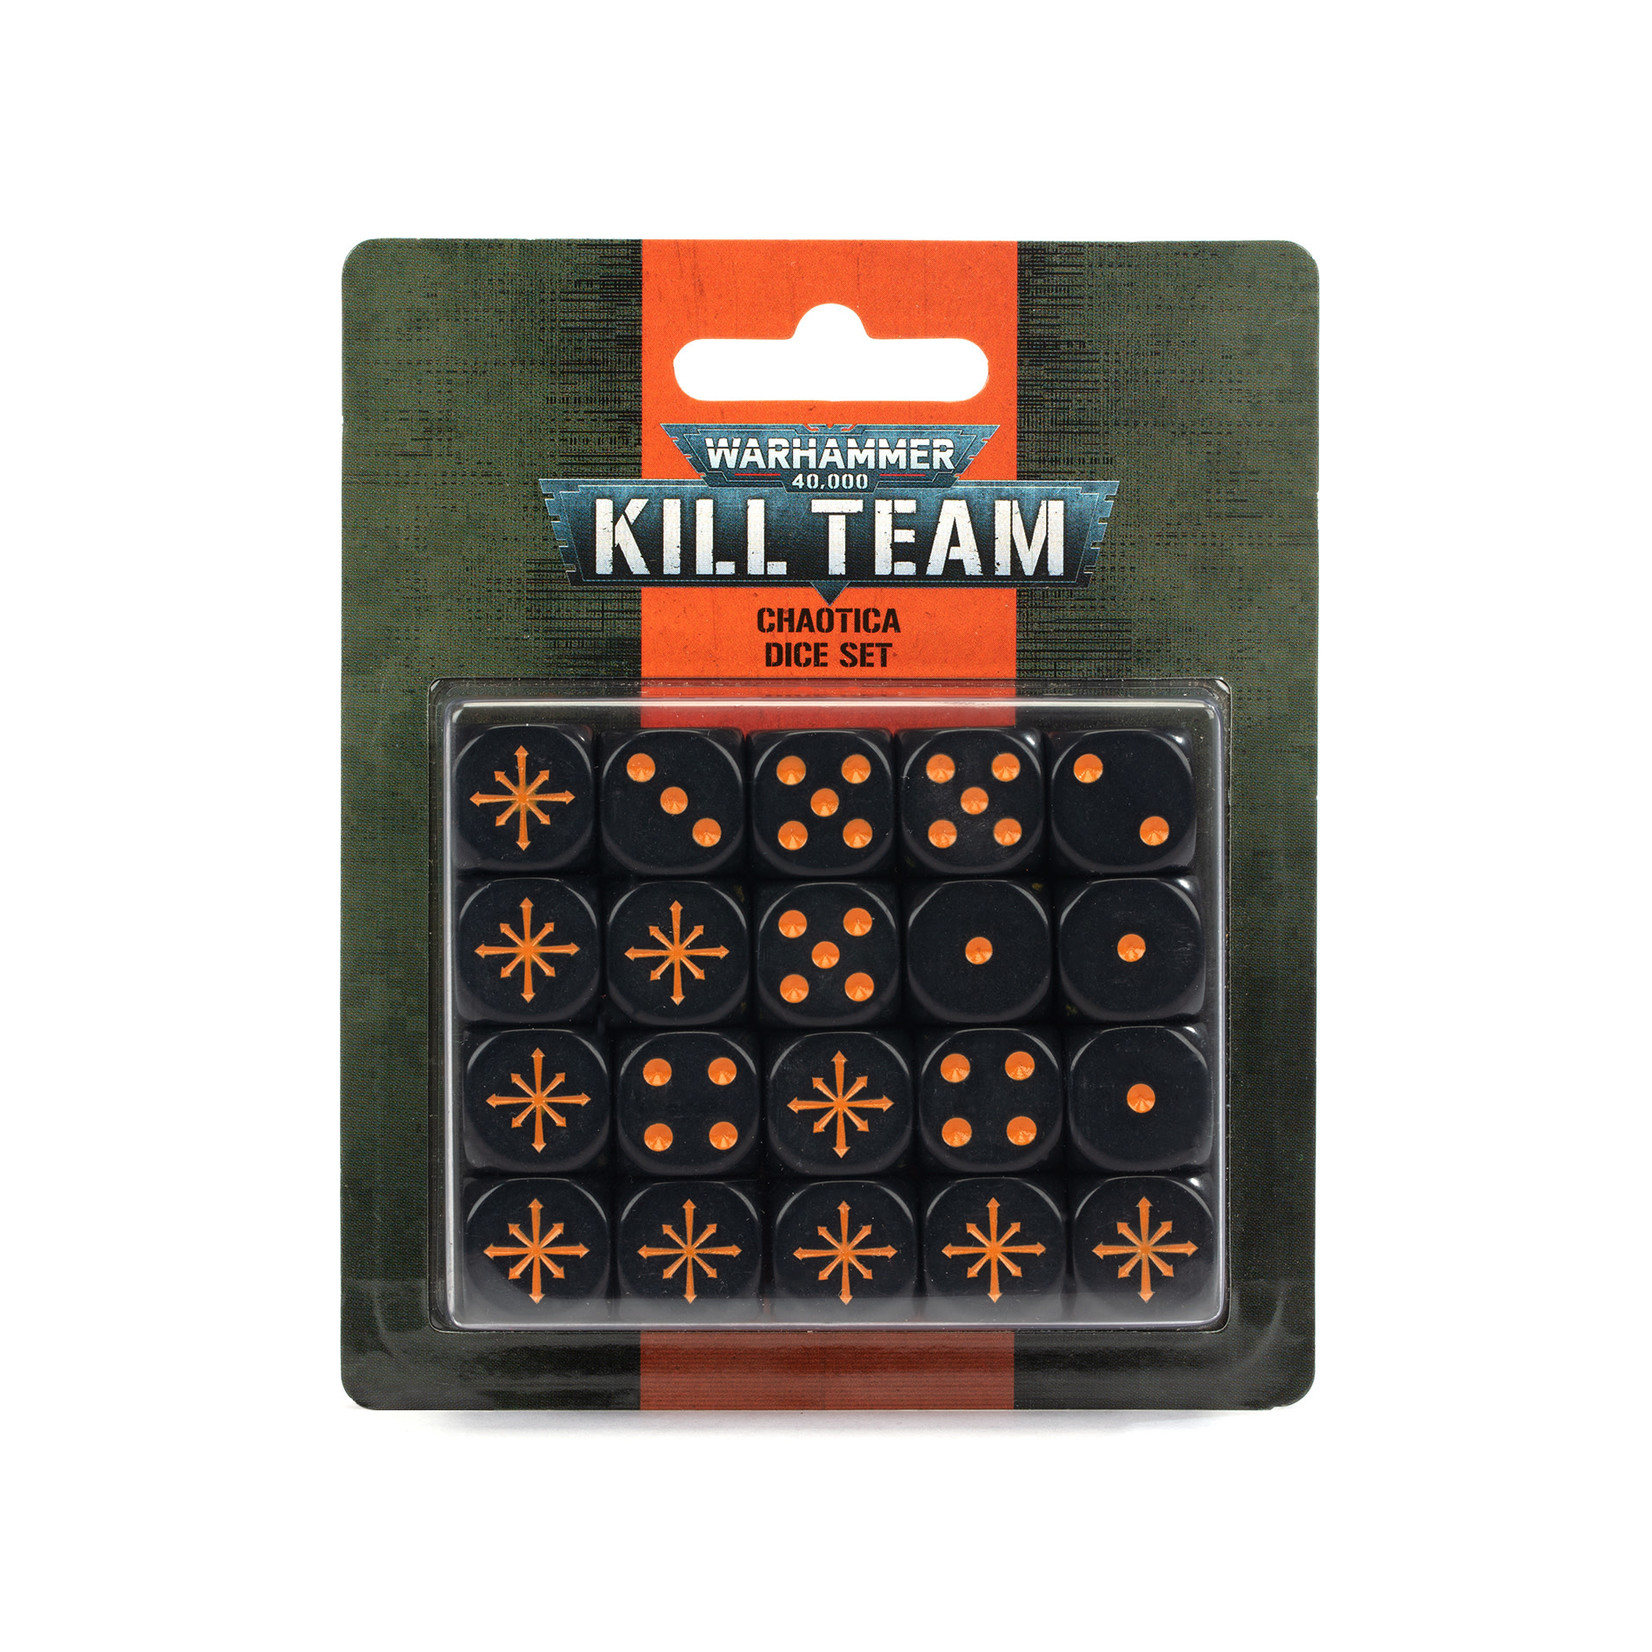 Games Workshop Warhammer 40k: Kill Team - Chaotica Dice Set